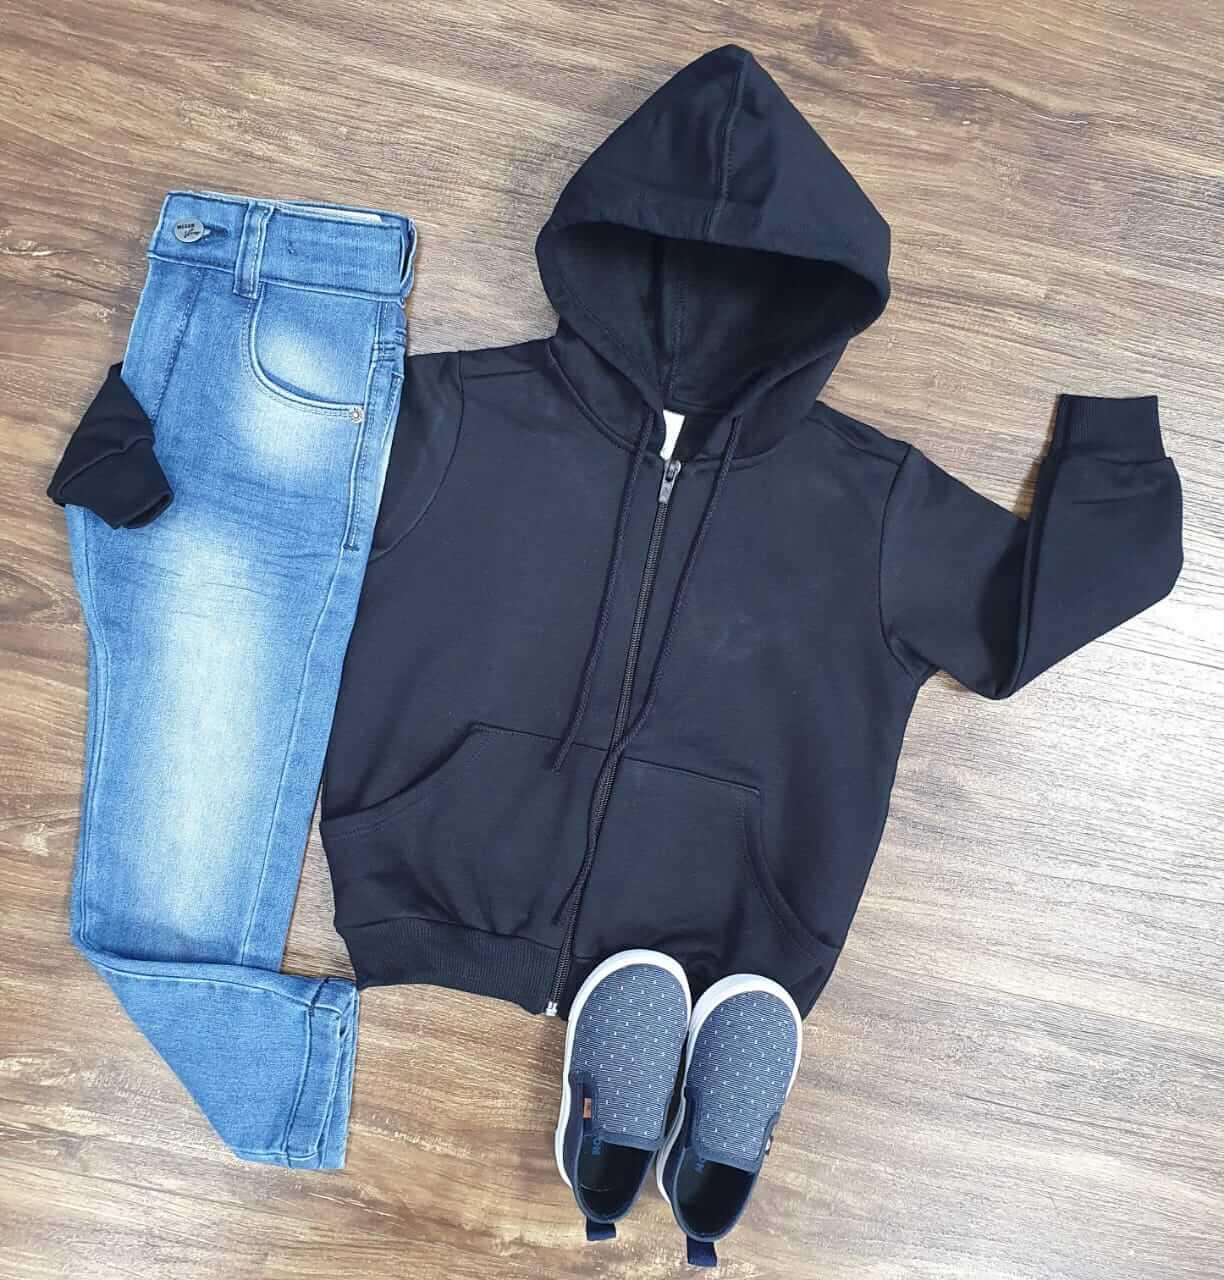 Calça Jeans com Jaqueta Preta Infantil